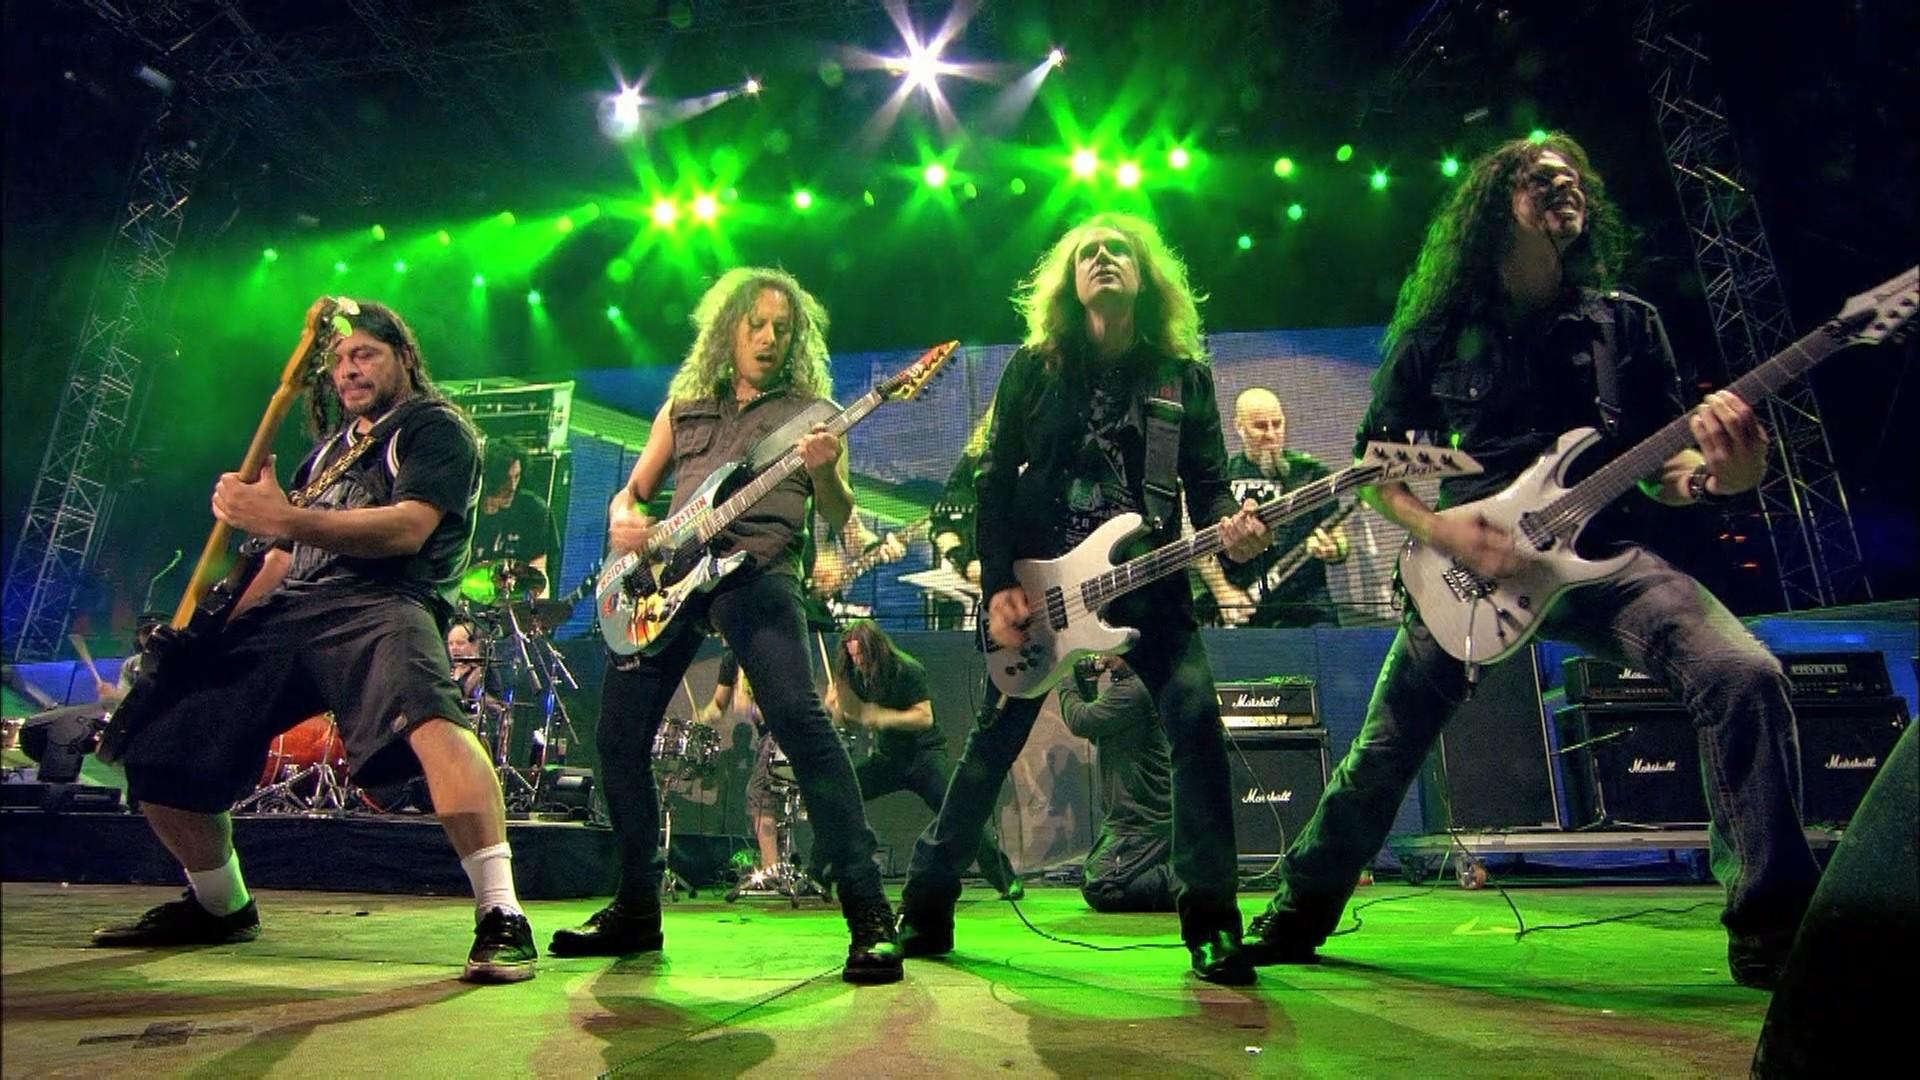 Megadeth Live Wallpaper Download Megadeth Live Wallpaper